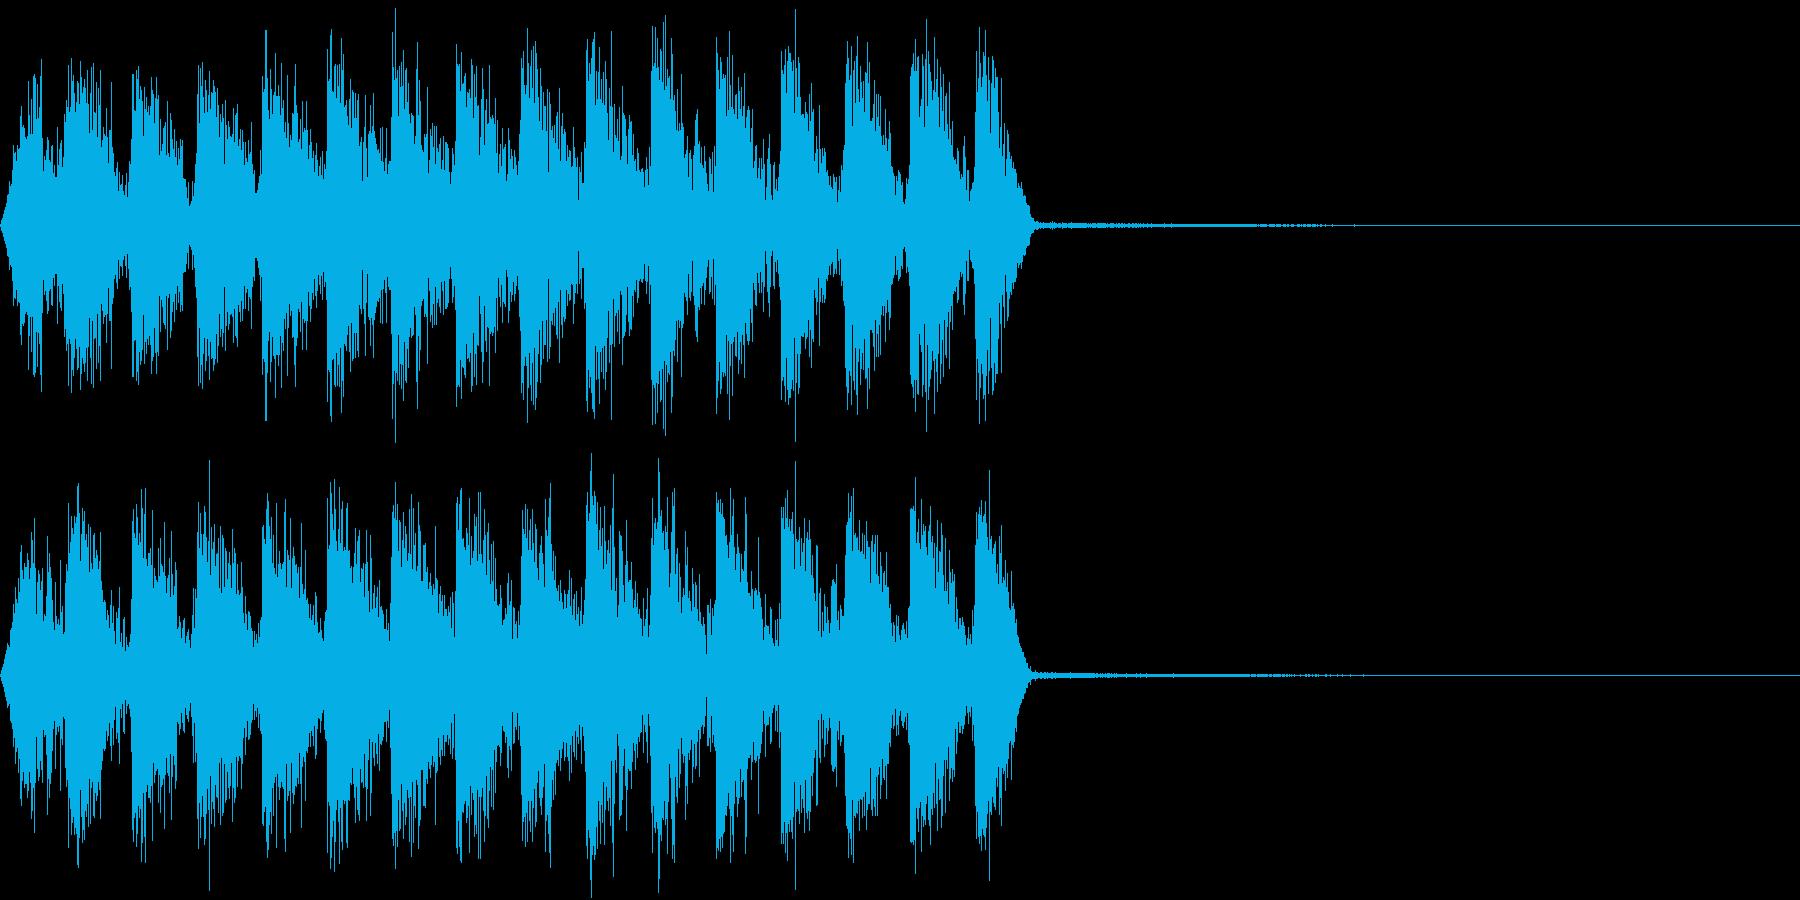 Razor レイザー小銃の連射音 4の再生済みの波形